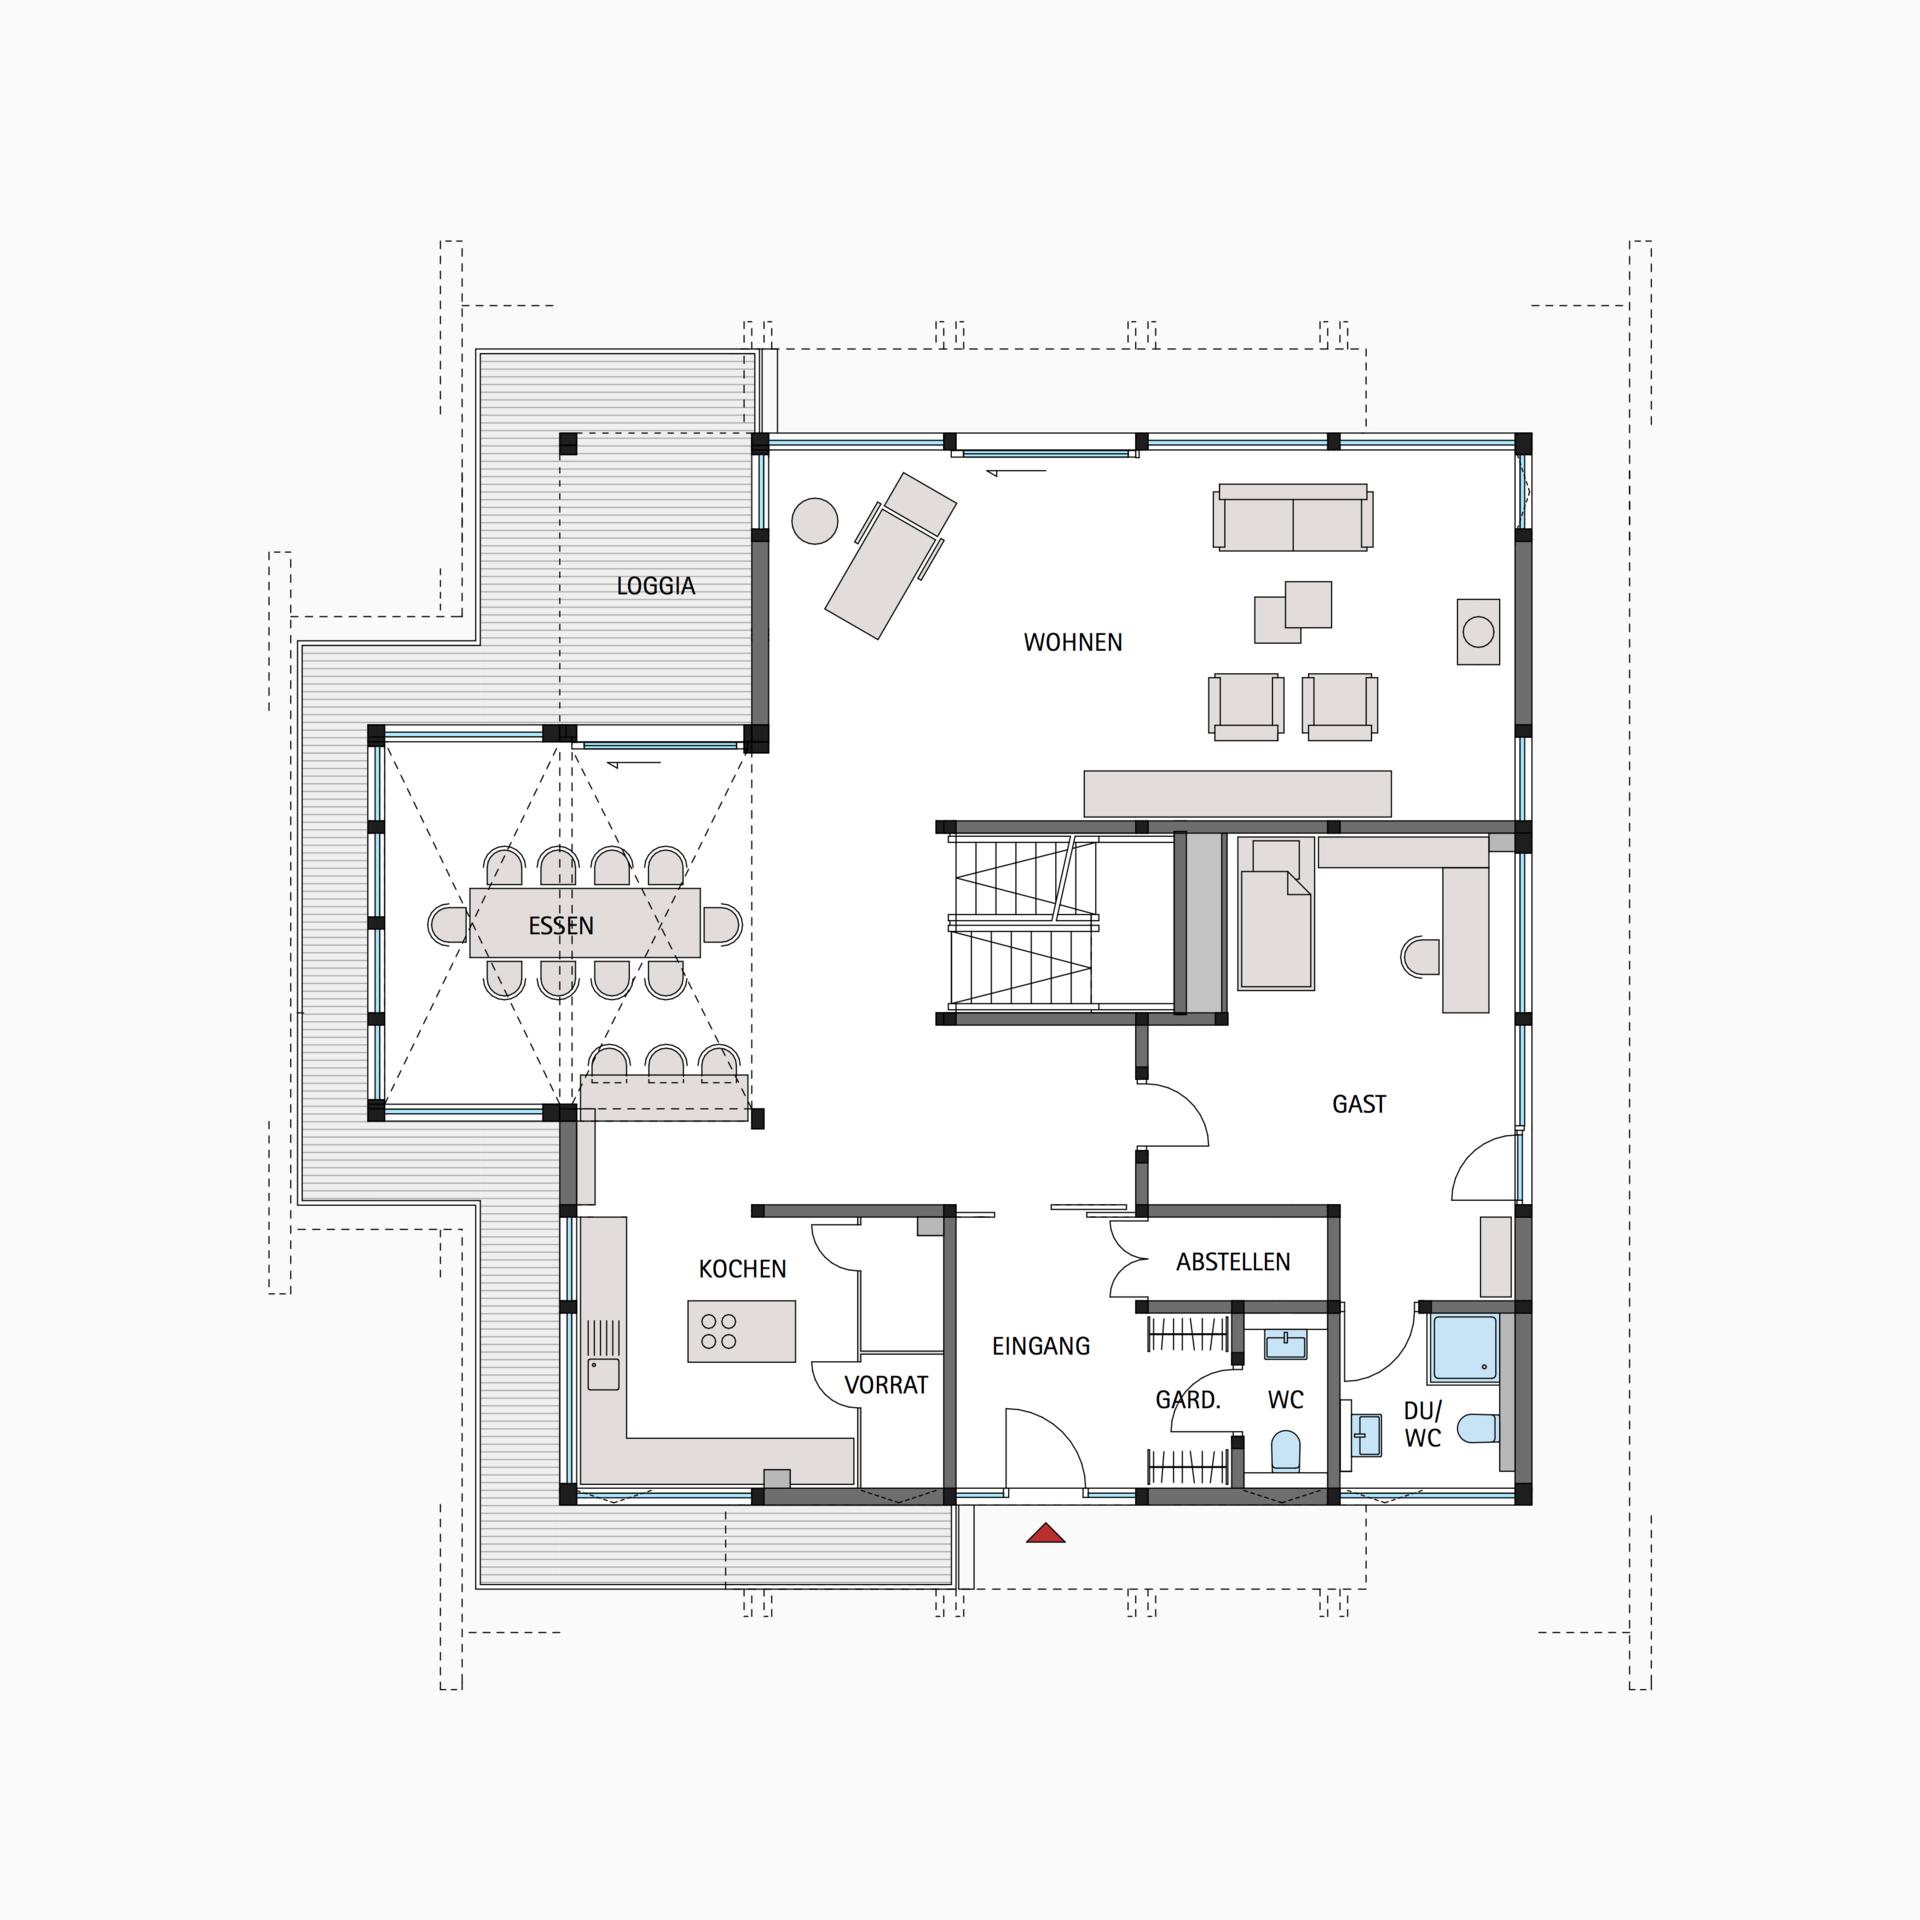 Art 5 Bauprojekt 3 Huf Haus Fachwerkhauser Haus Haus Ideen